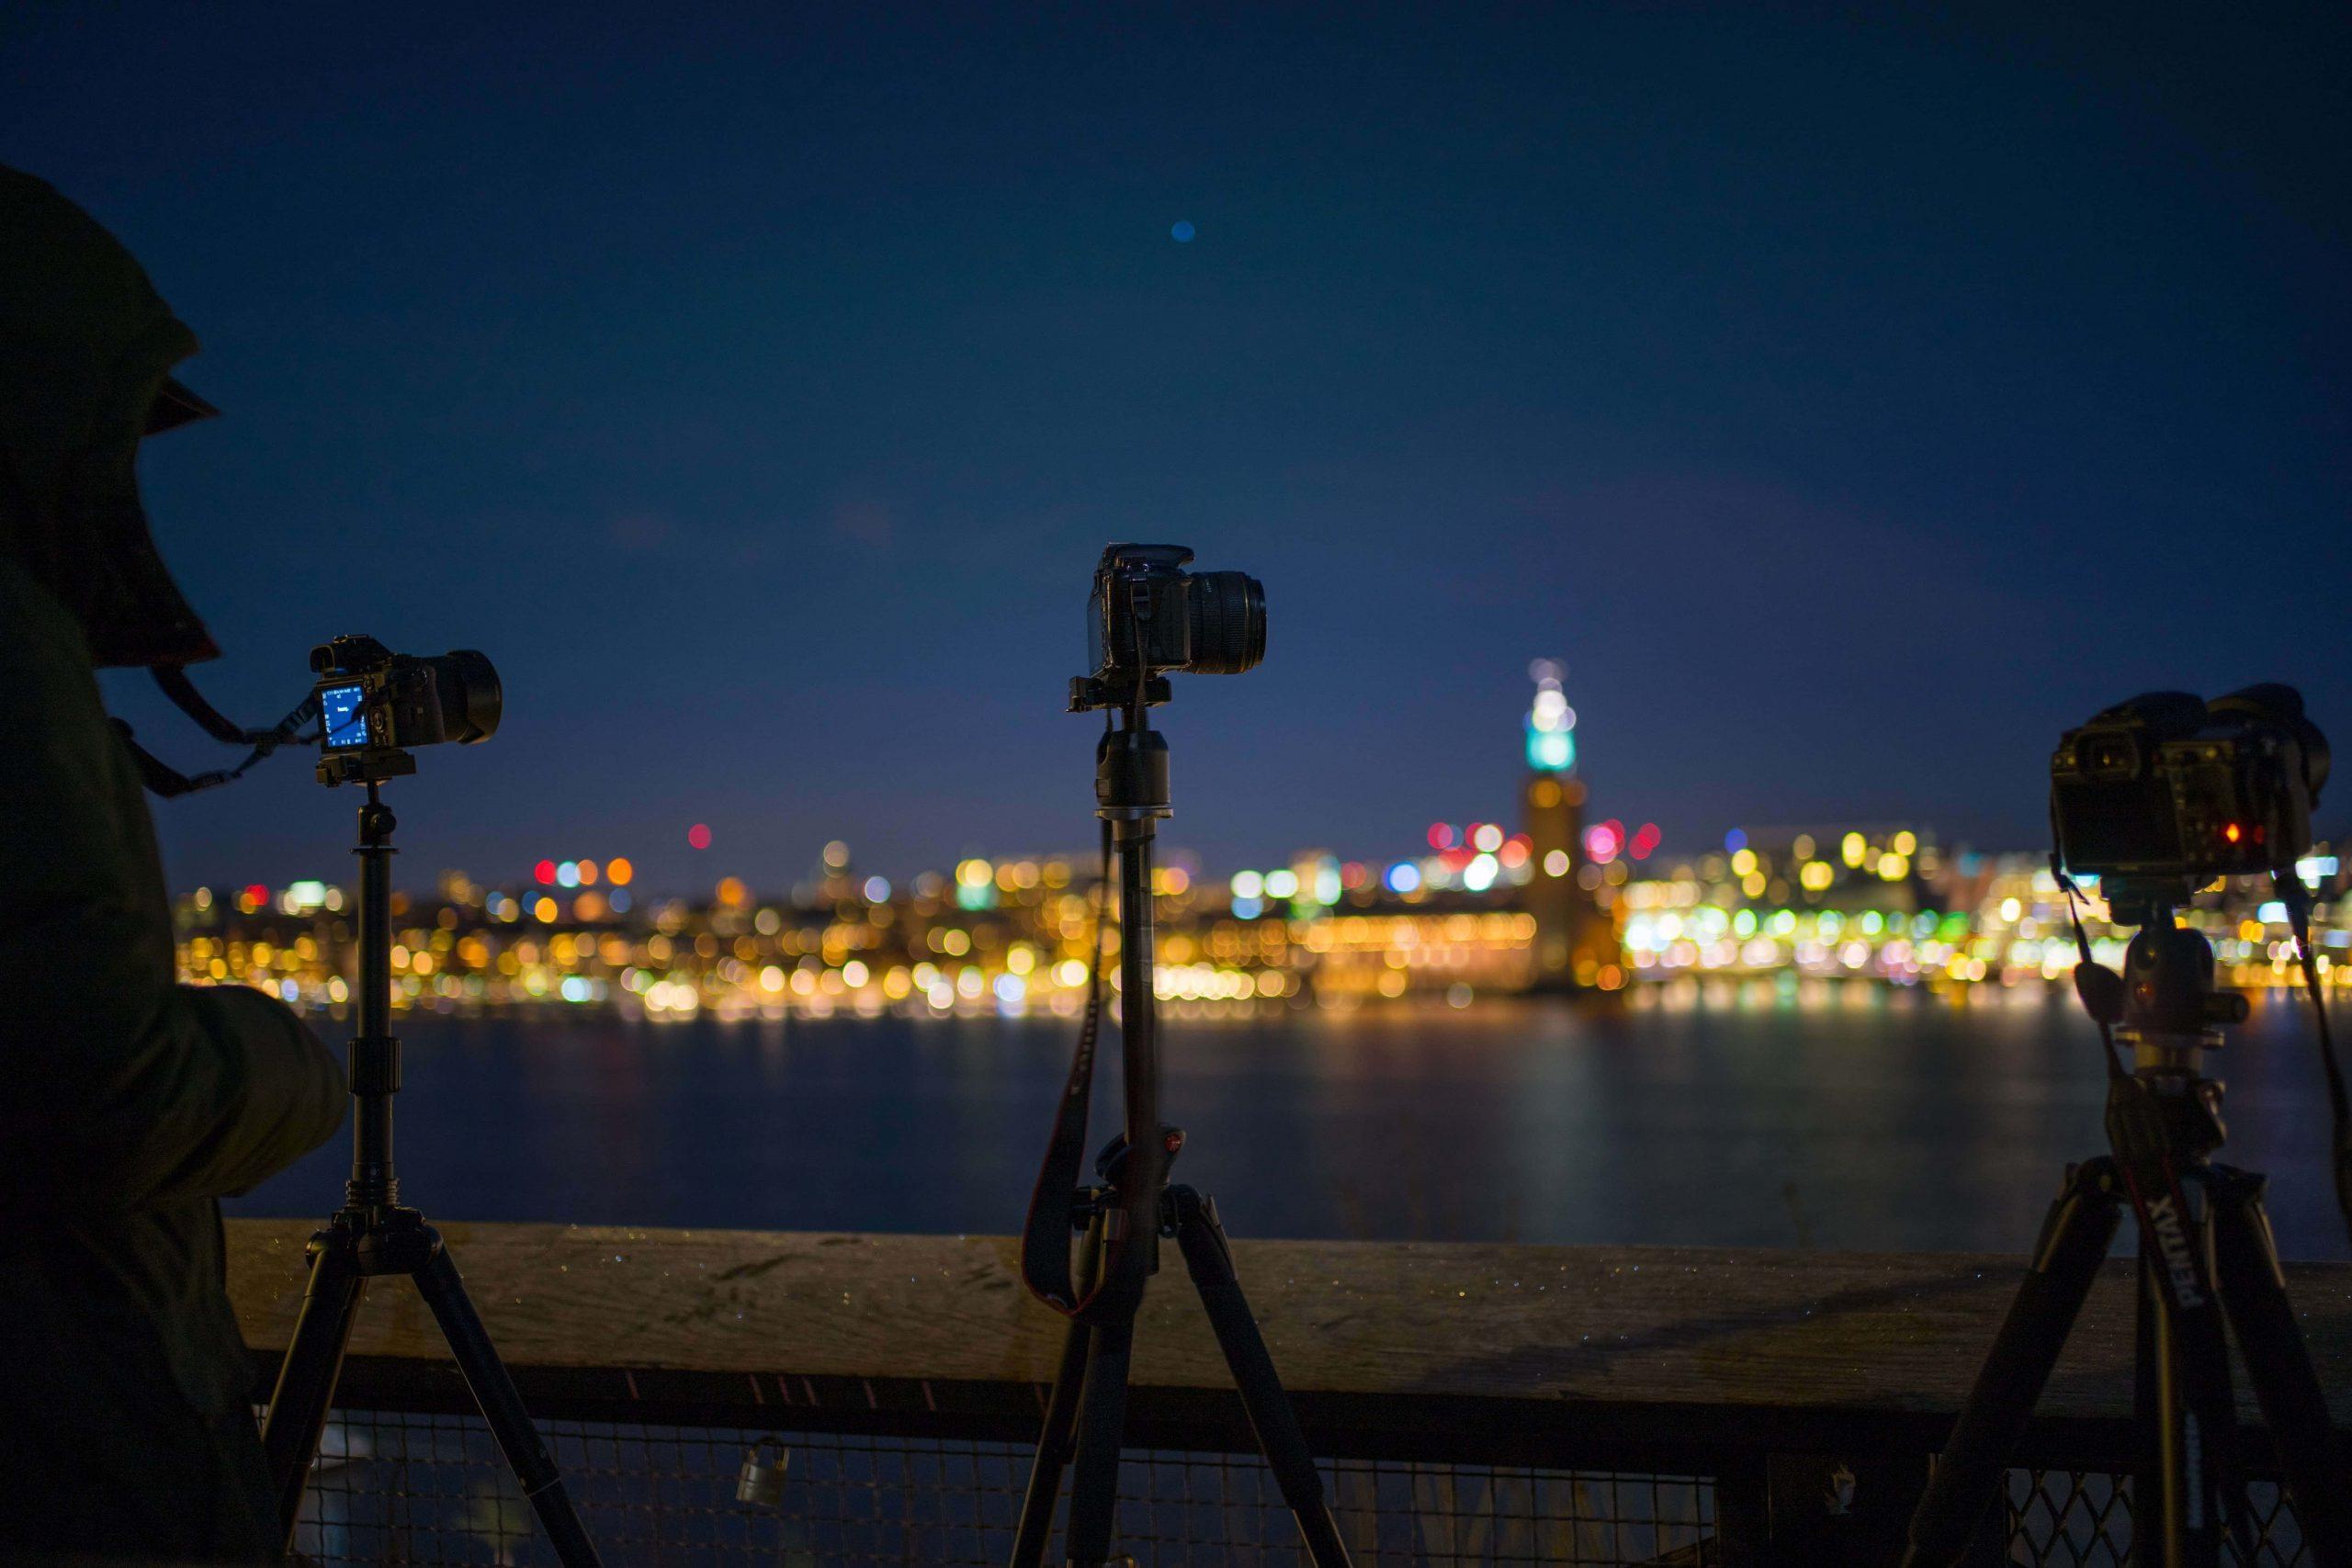 blur-blurred-background-bokeh